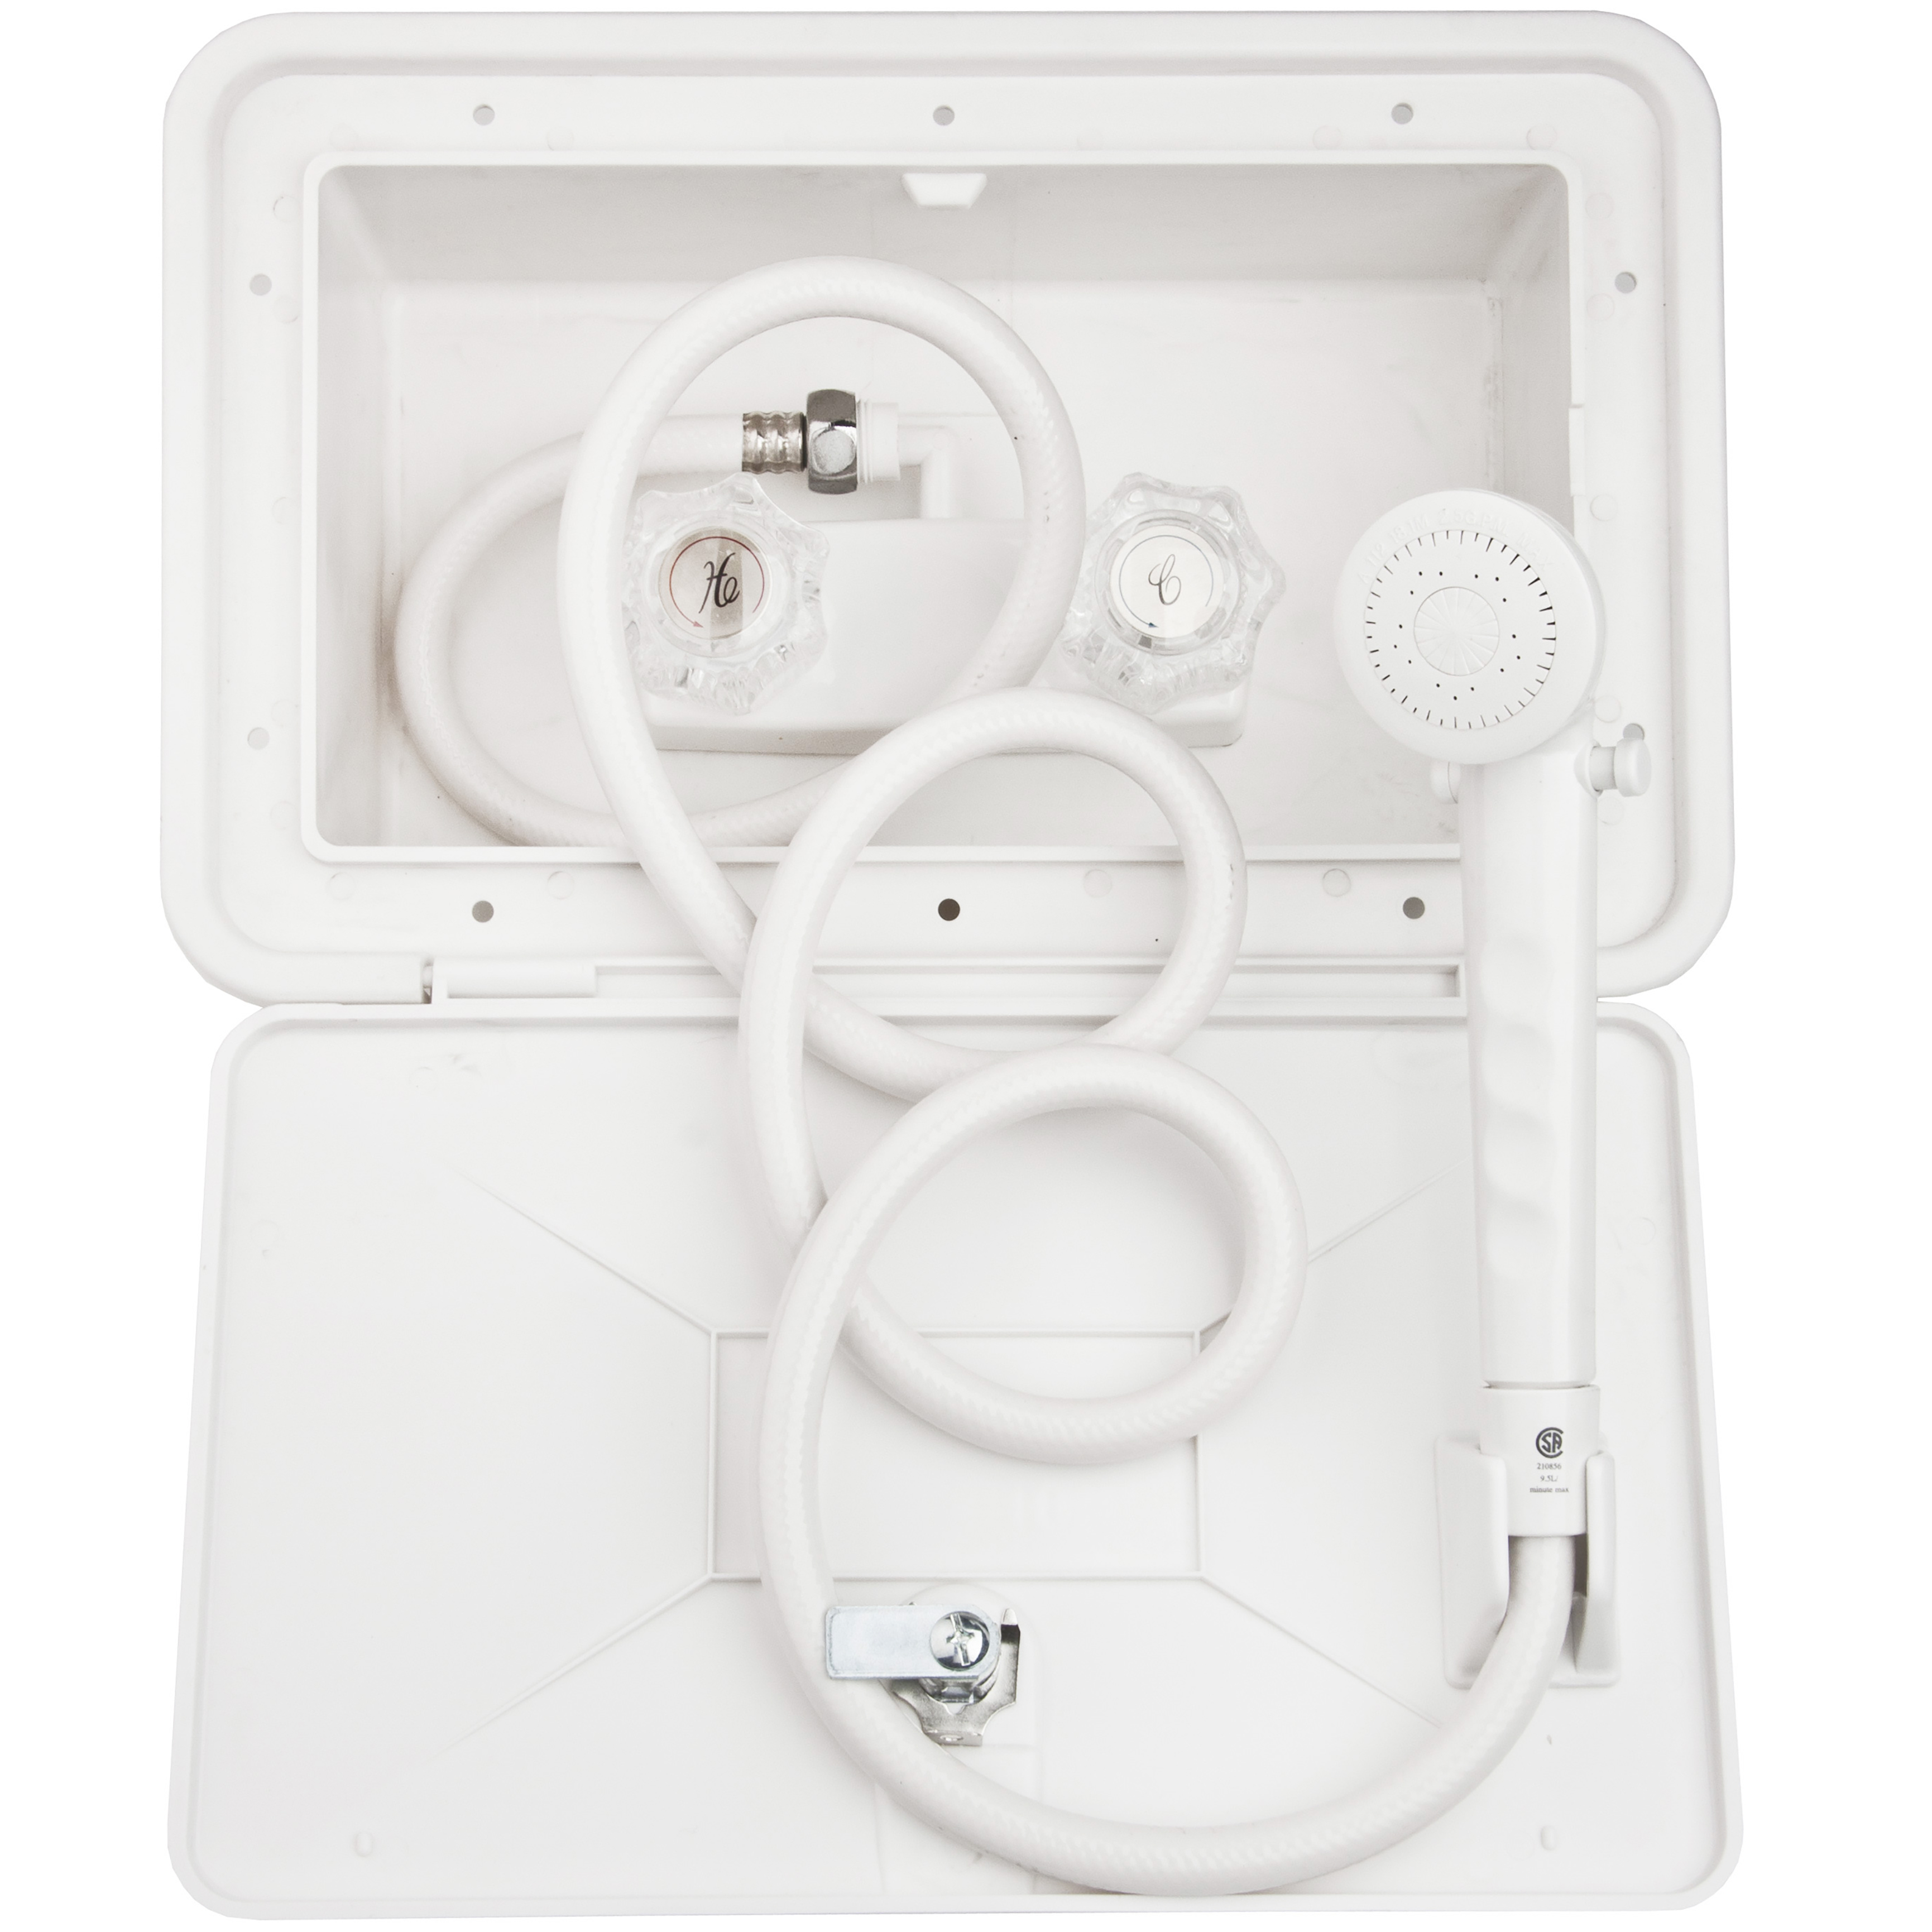 Dura Faucet RV Exterior Shower Box Kit - Black